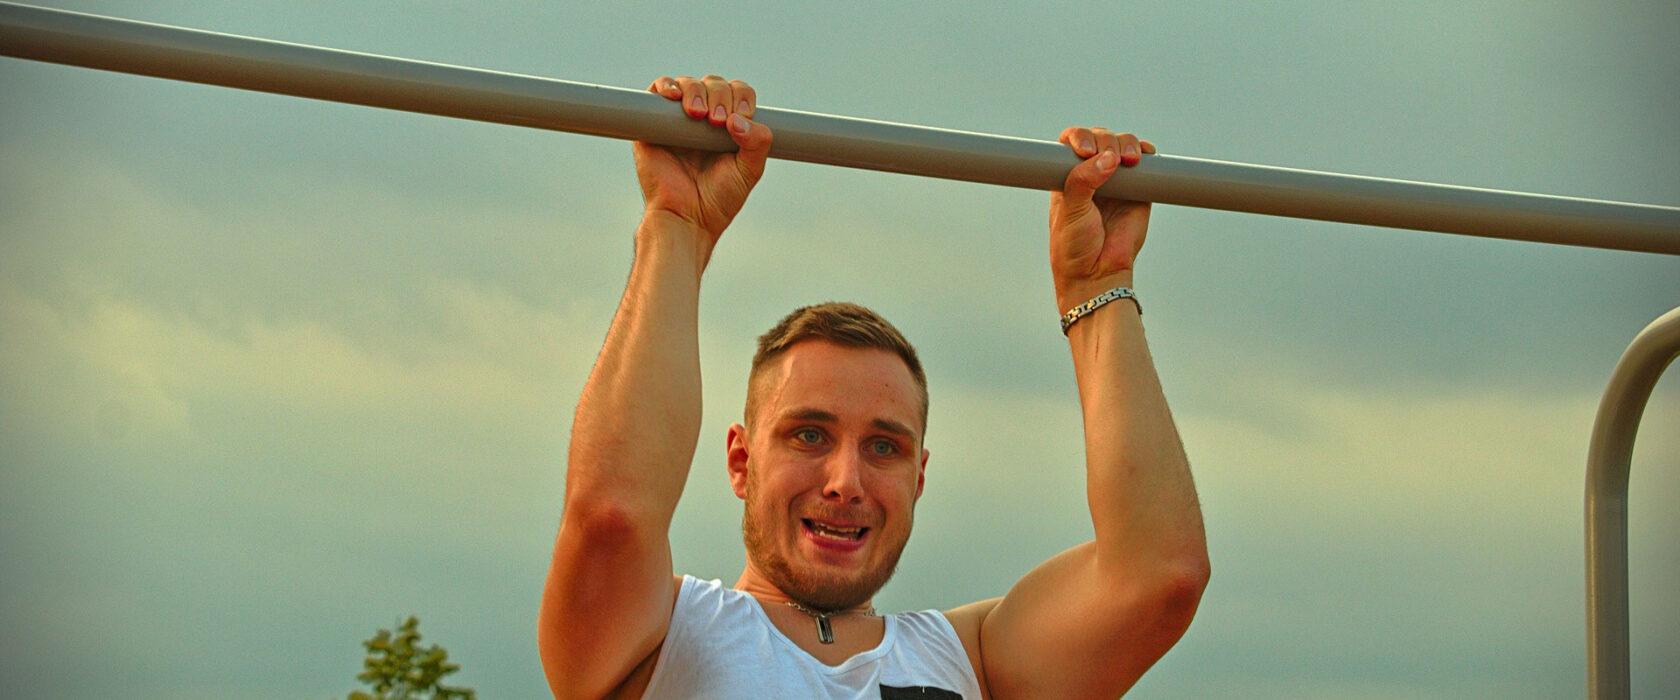 Klimmzug-Training